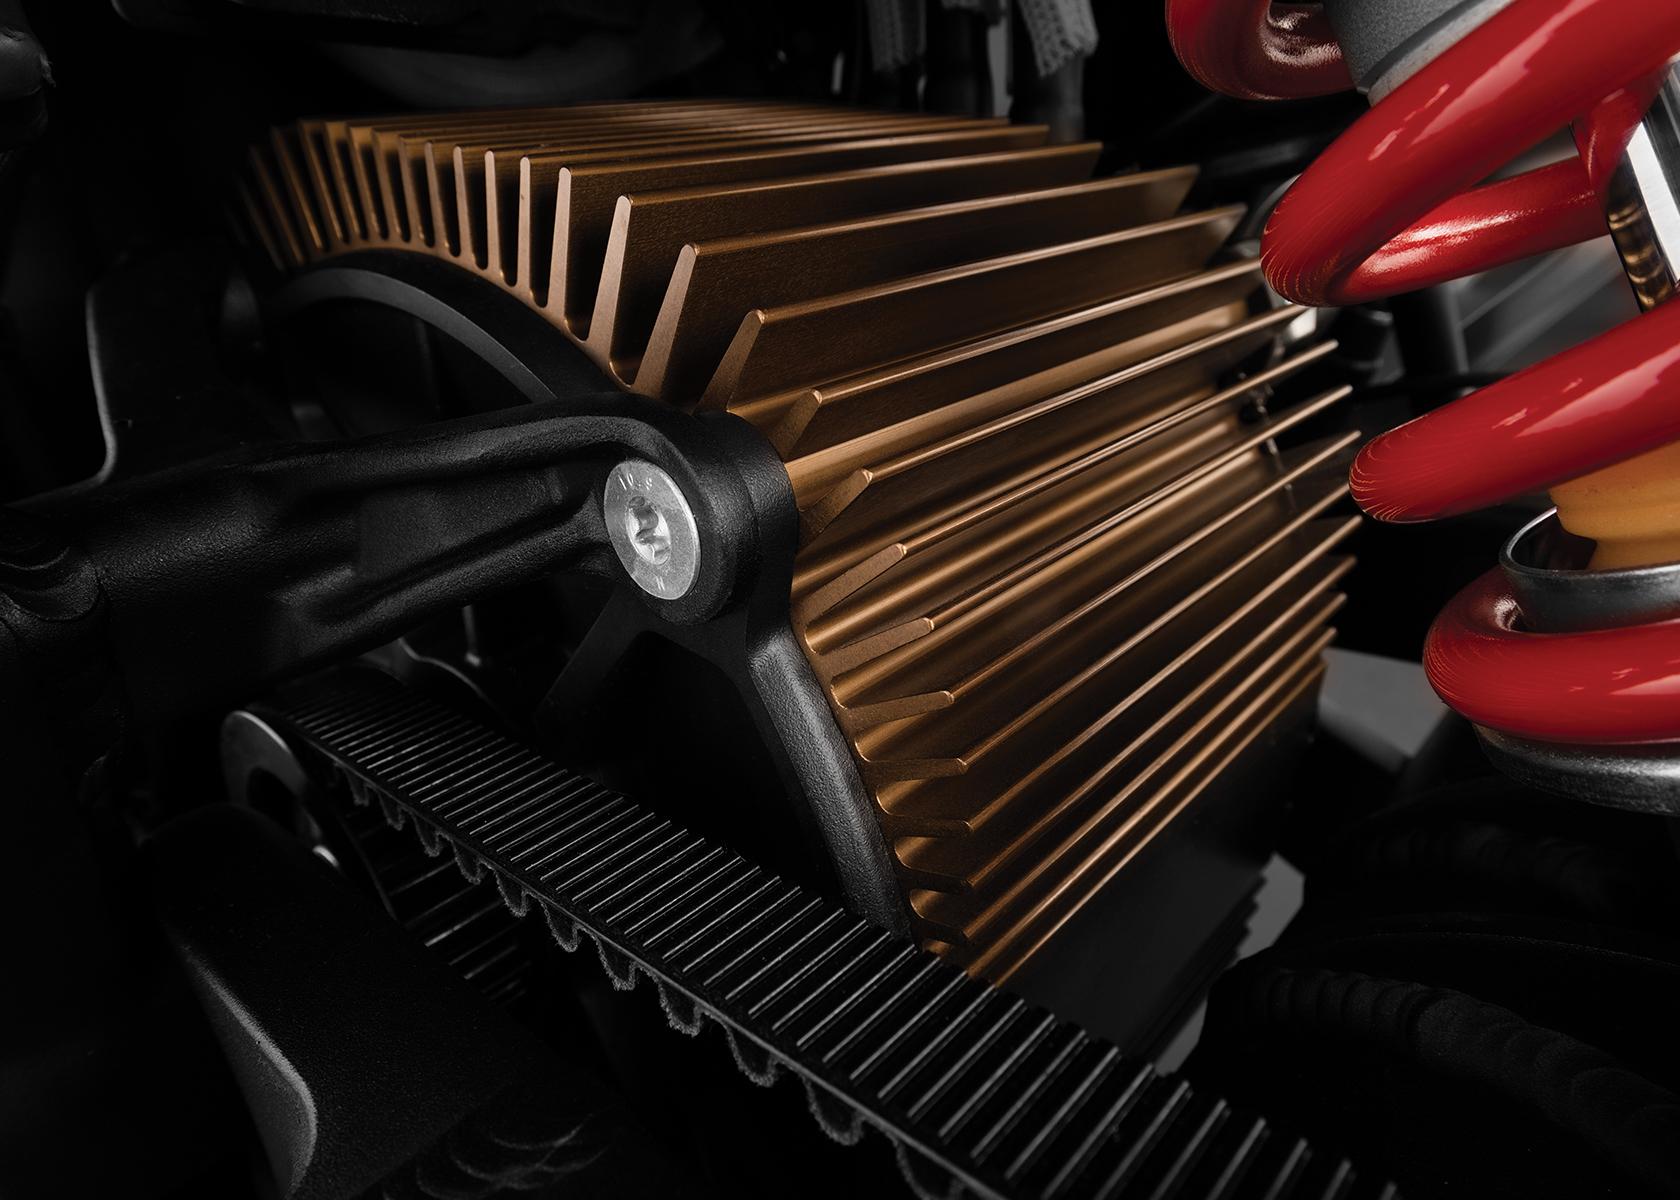 2018 Zero SR Electric Motorcycle: Motor